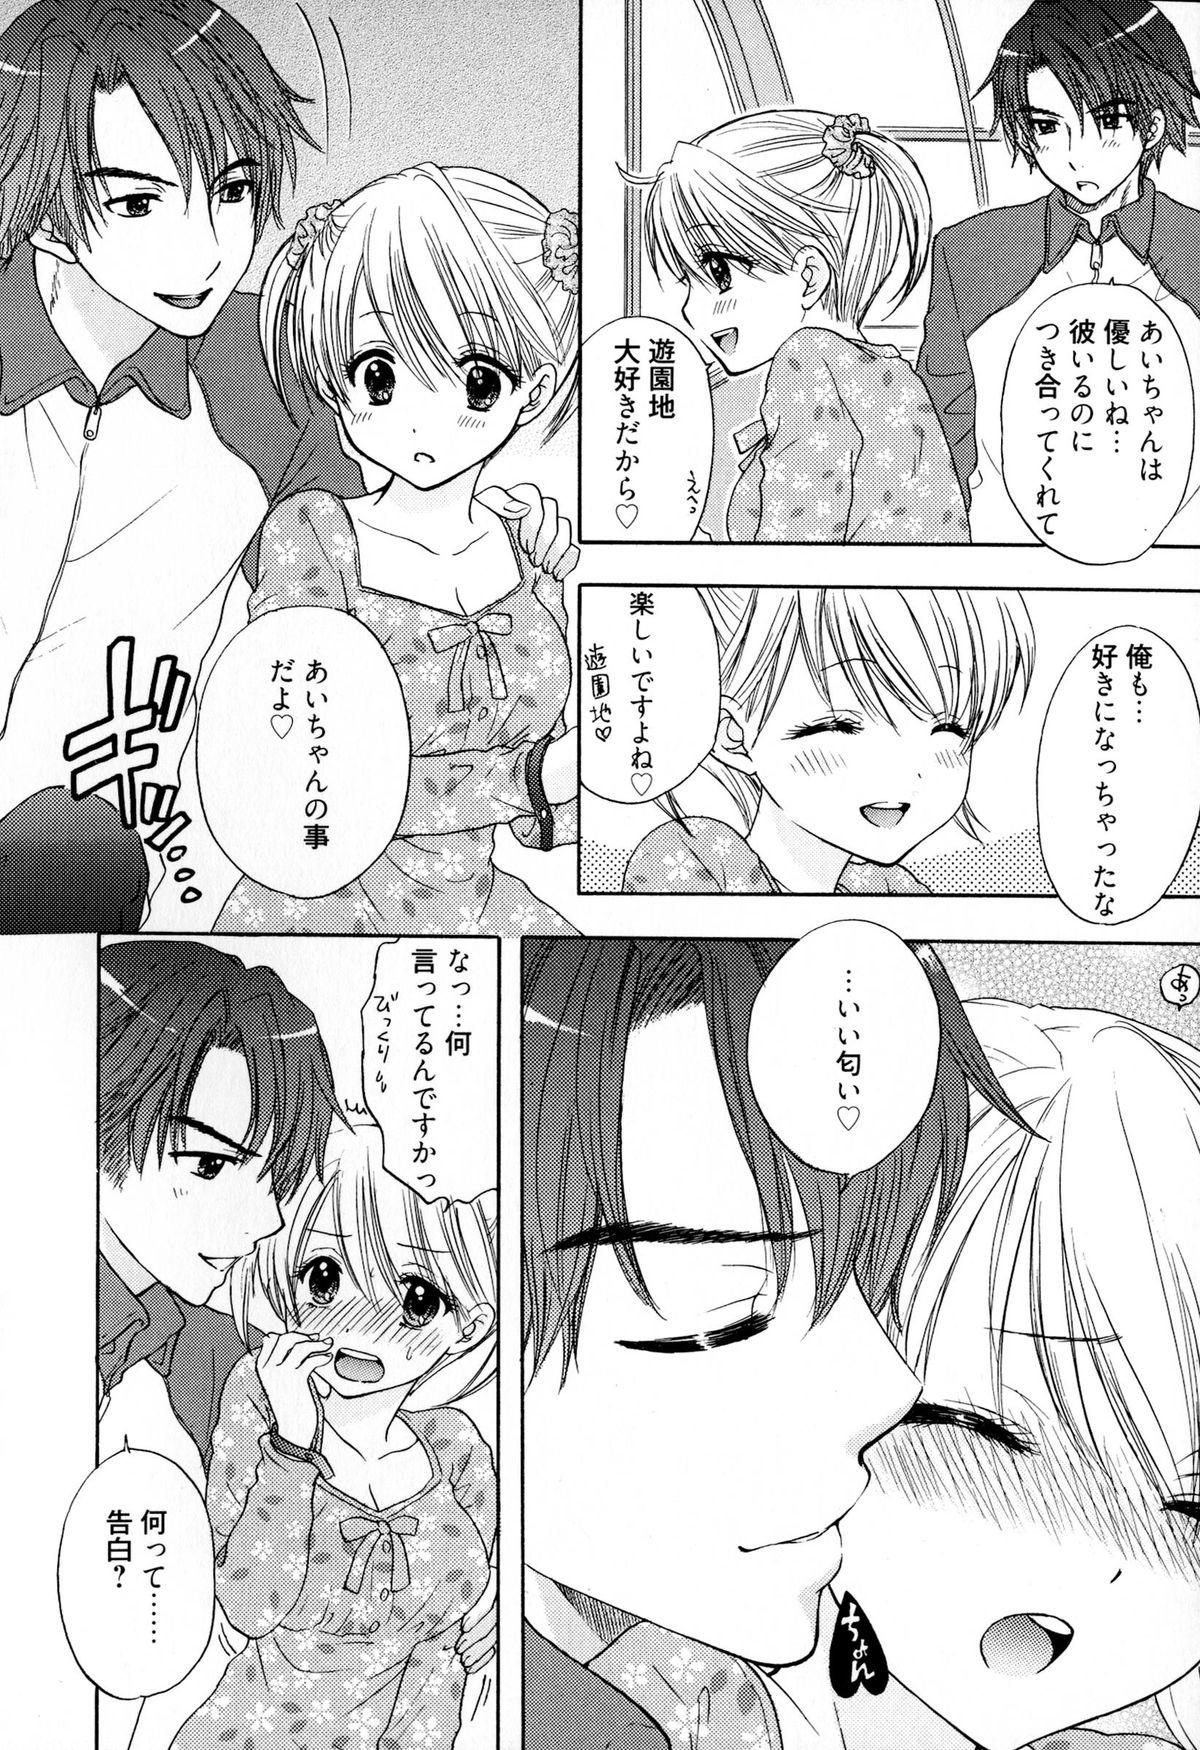 The Great Escape 4 Shokai Genteiban 107